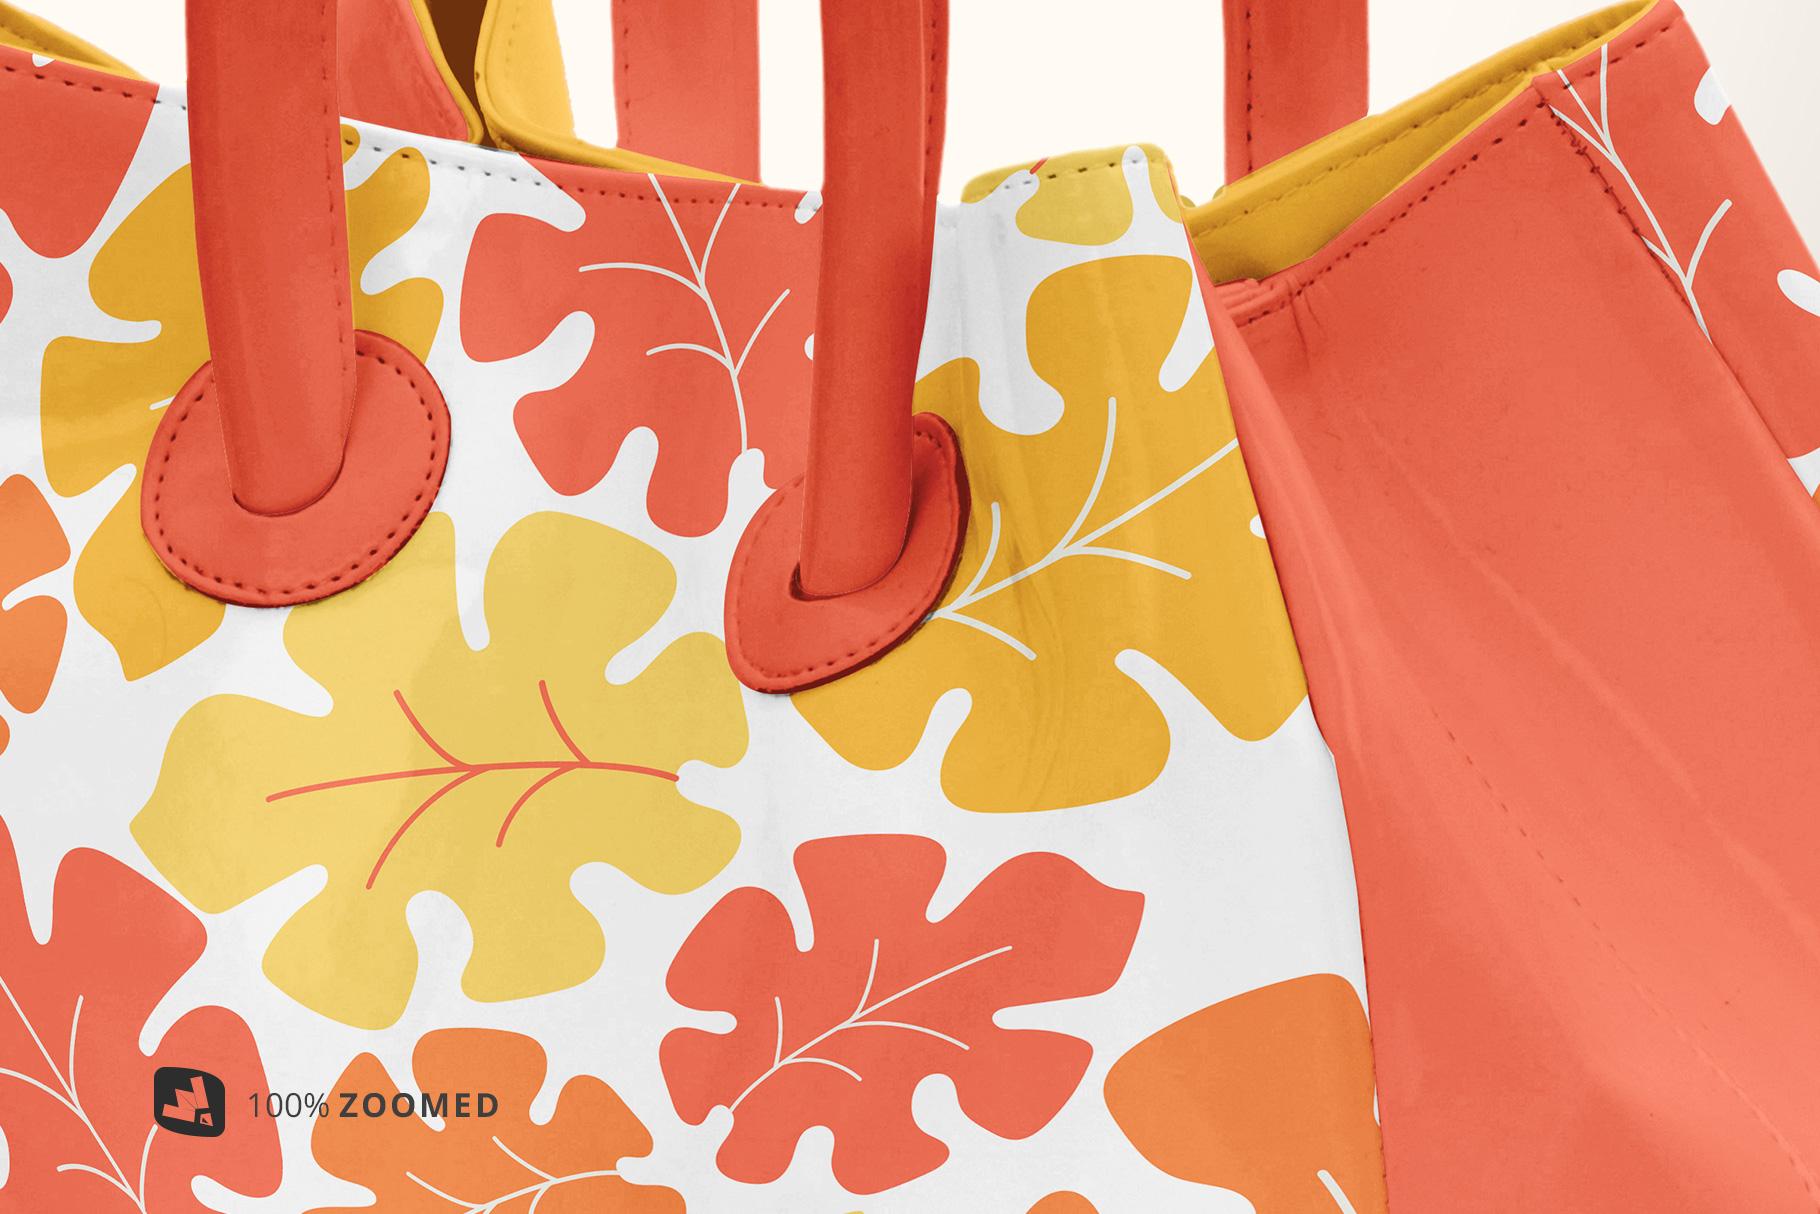 zoomed in image of the female handbag mockup